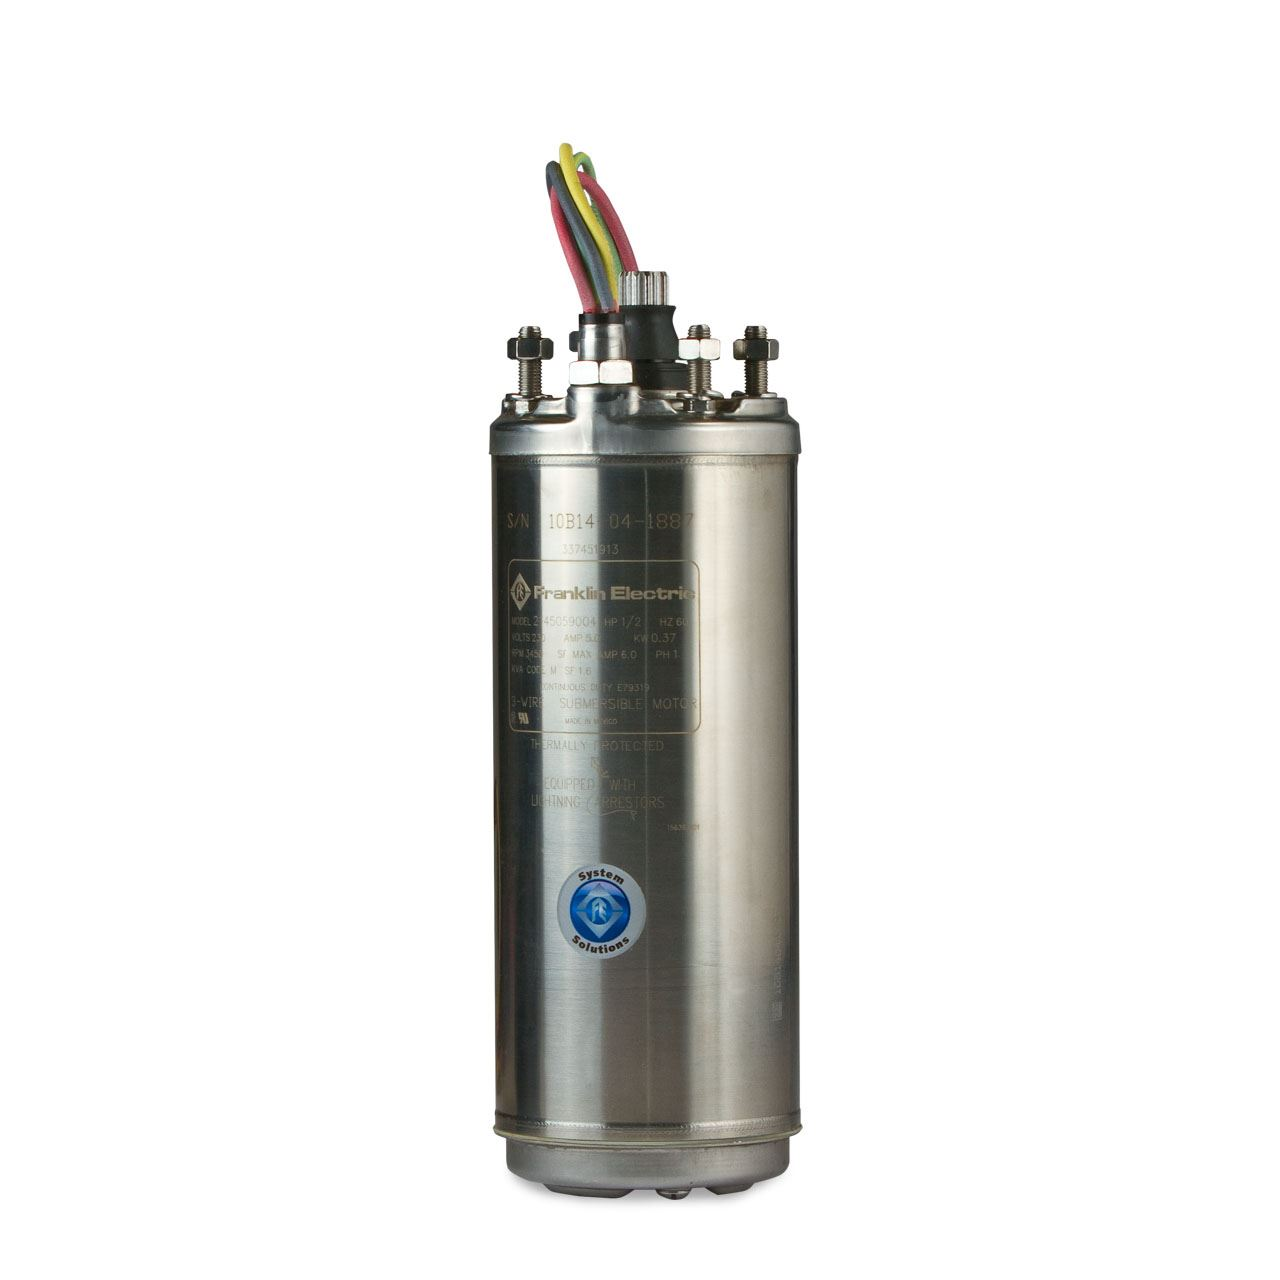 Franklin Well Pump Wiring Best Secret Diagram Electric Motors Diagrams 2145049004 Super Control Box For